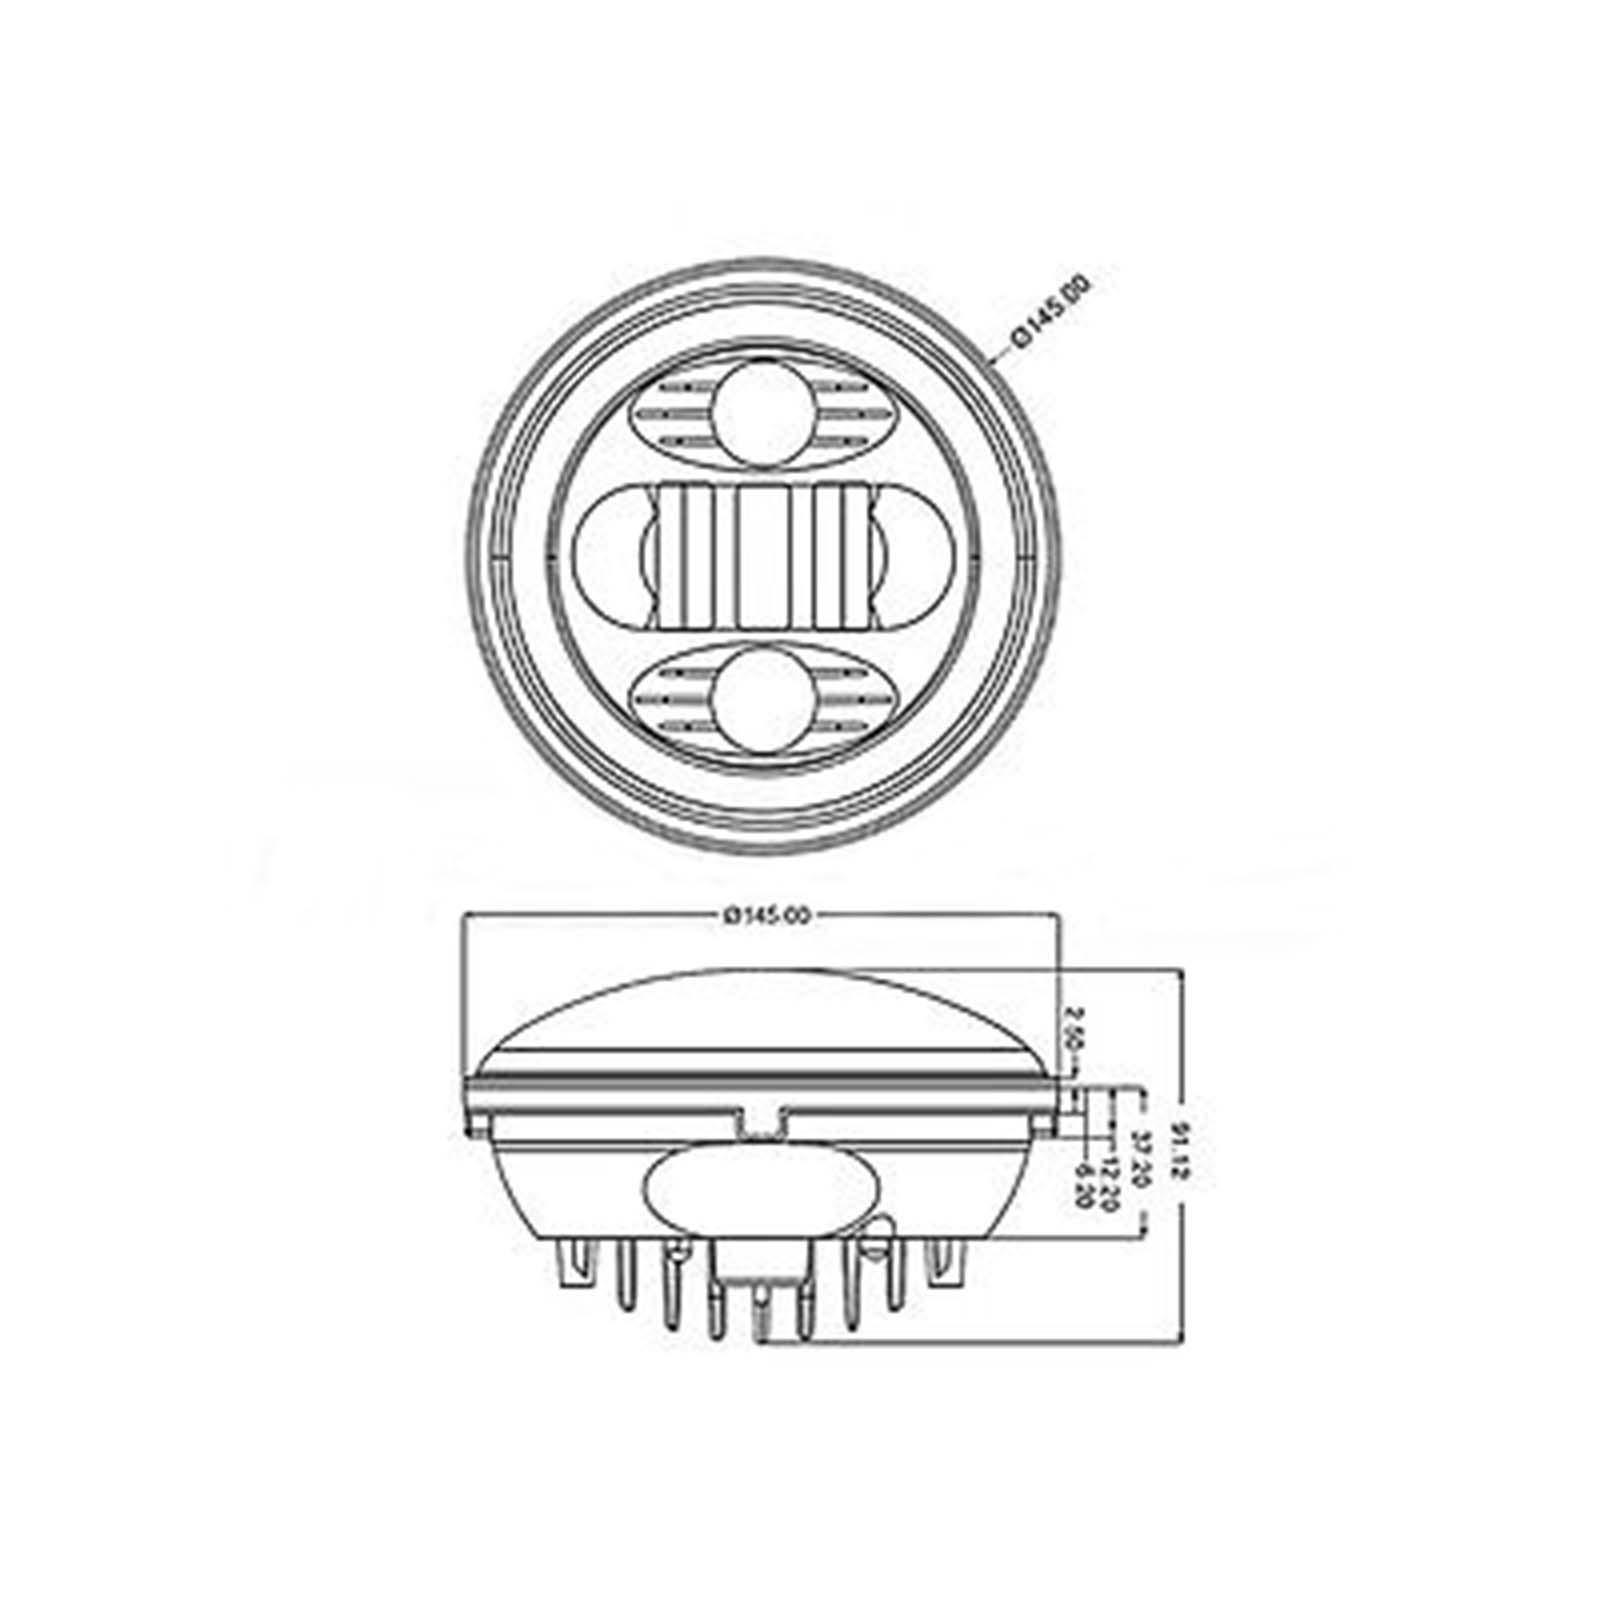 Bmc Wiring Diagram